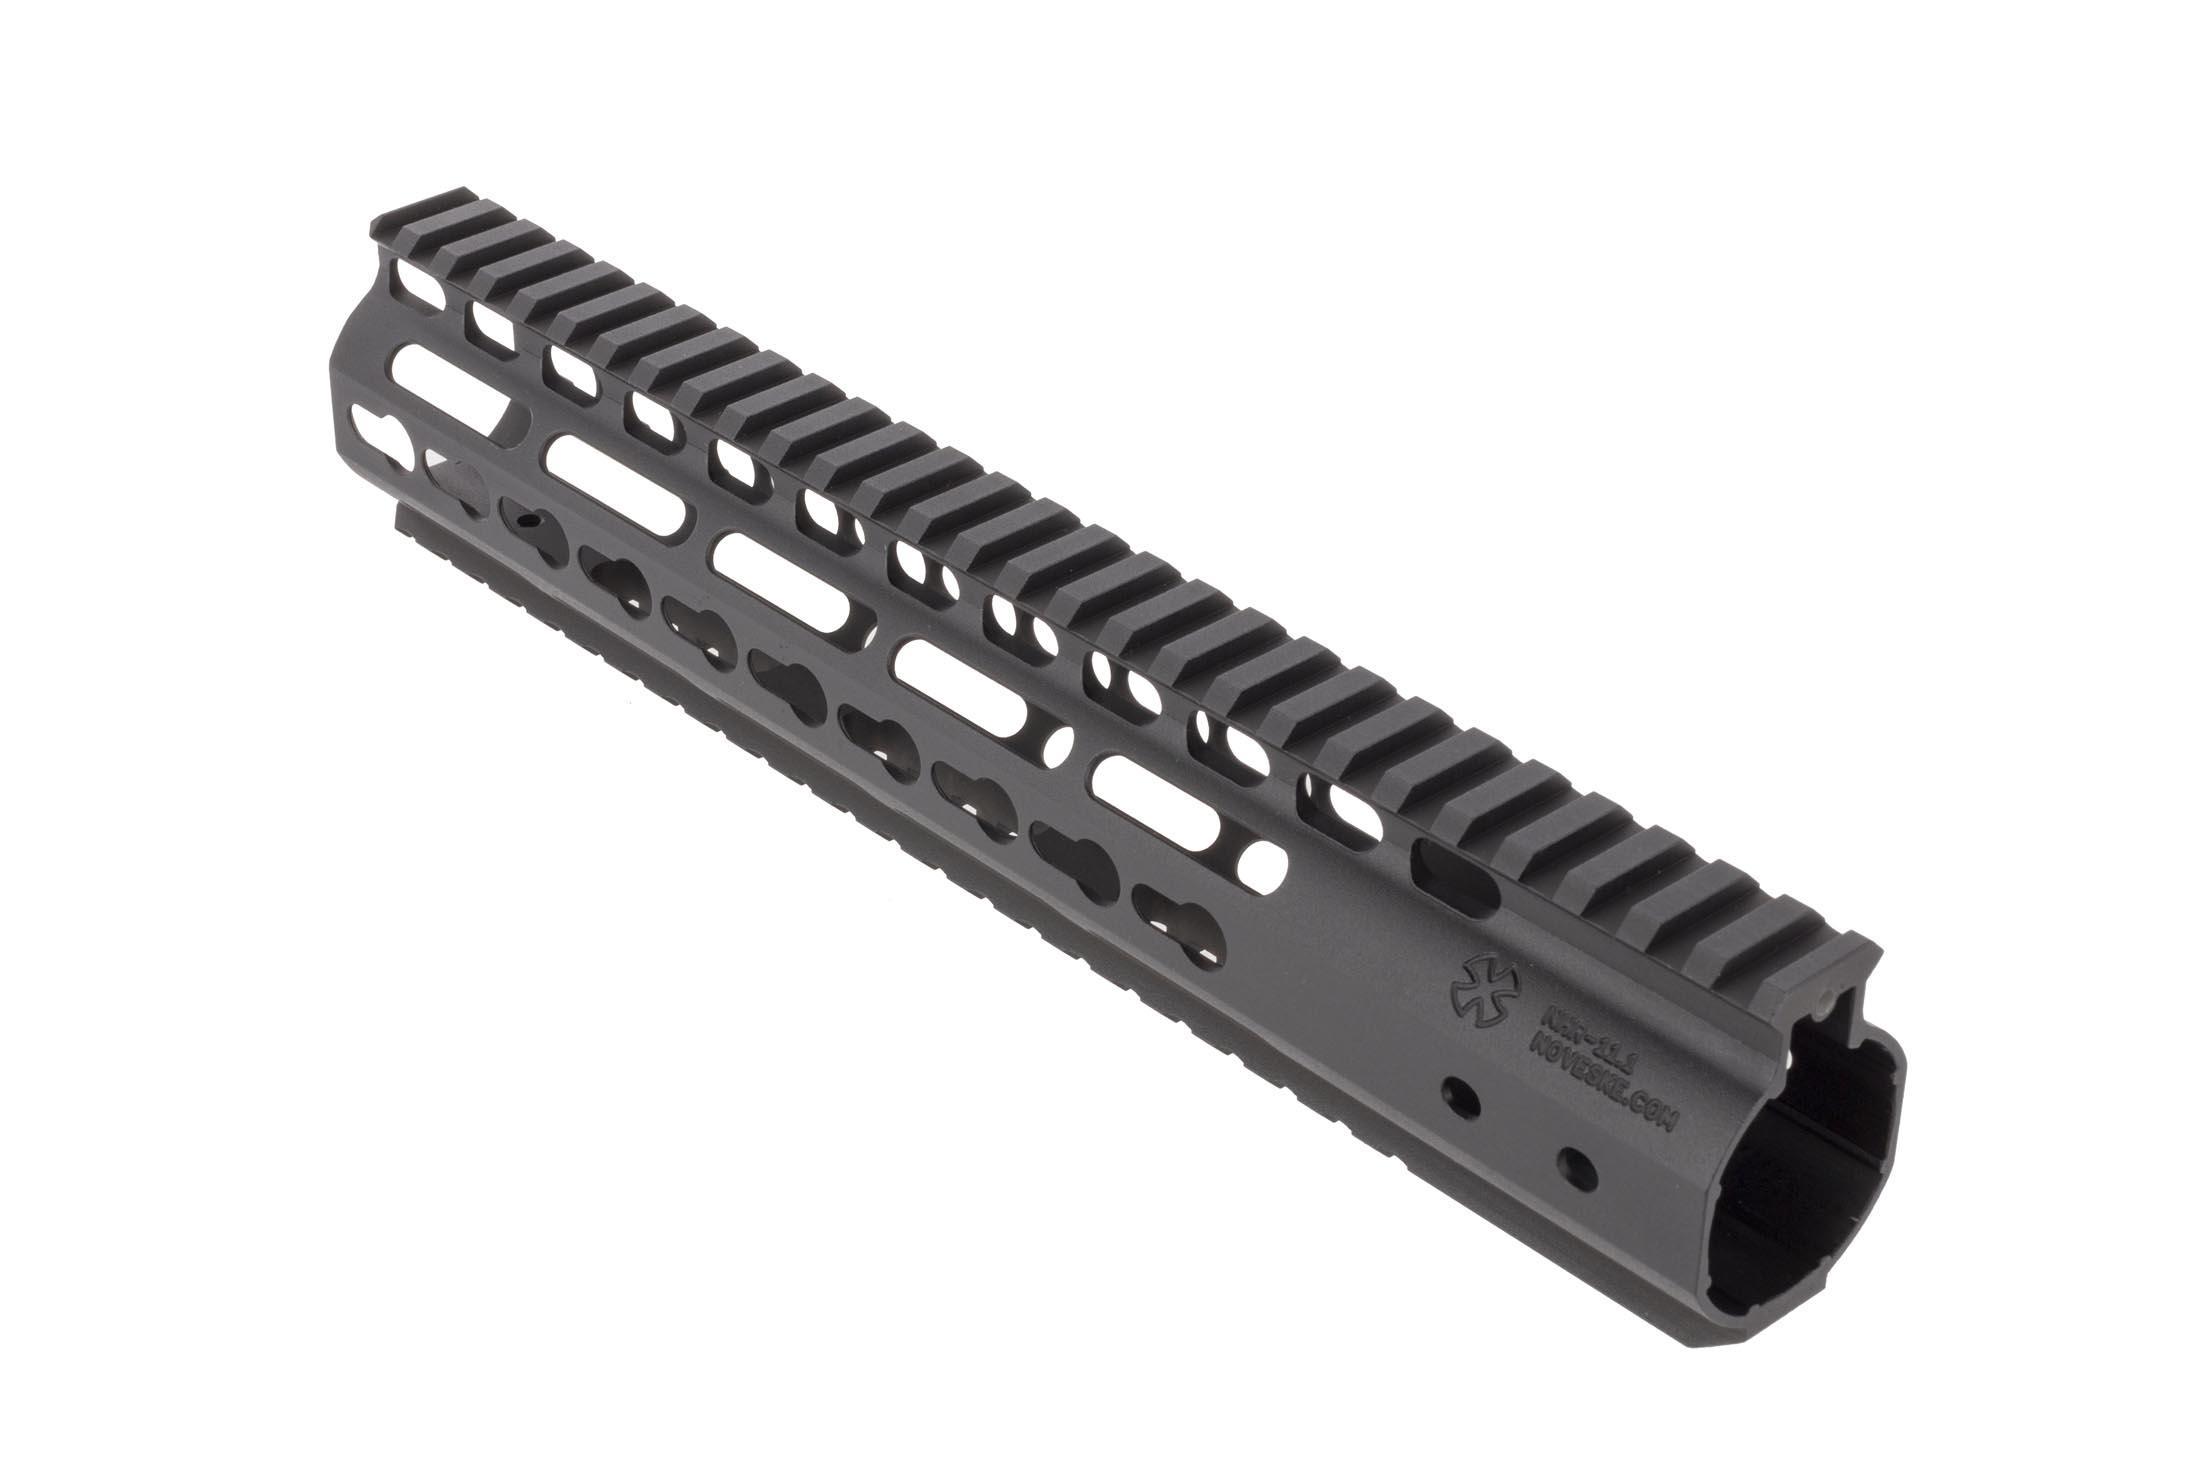 Noveske Rifleworks 11 Nhr Hybrid Keymod Ar 15 Handguard Black